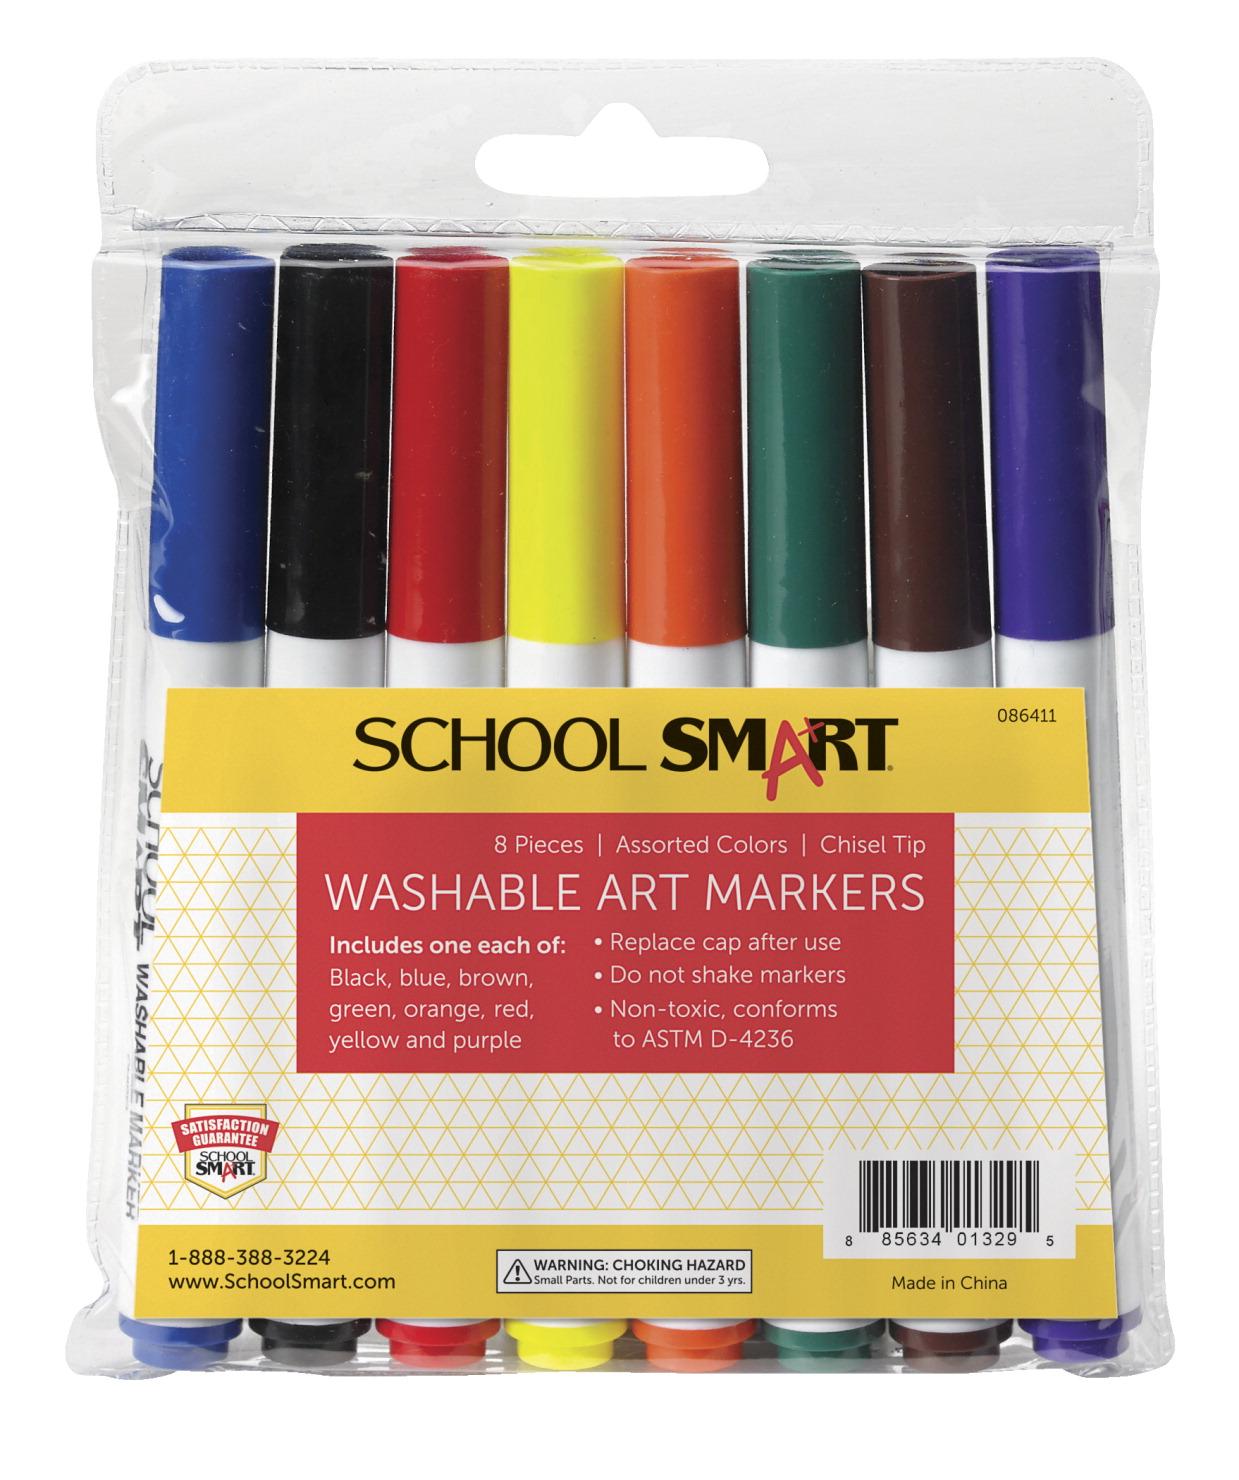 School Smart Washable Marker, Chisel Tip, Assorted Colors